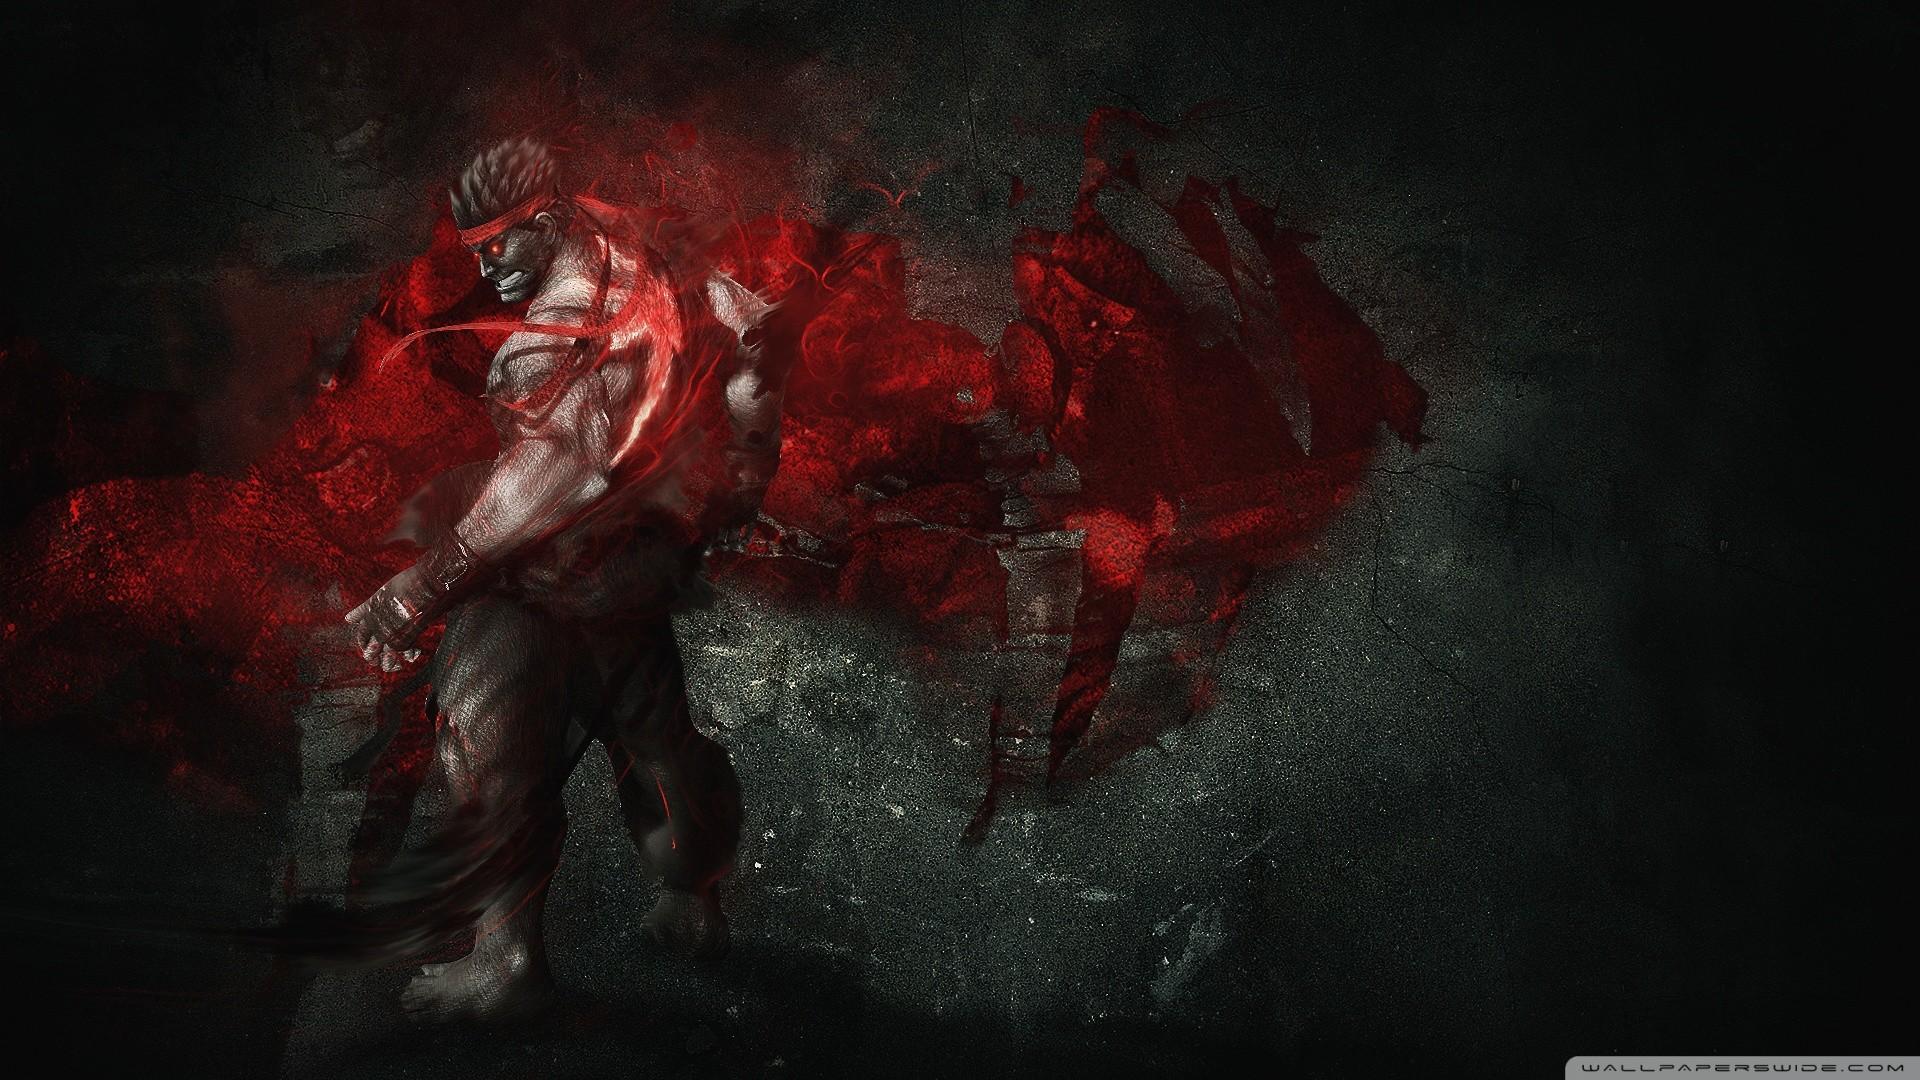 Evil Ryu HD Wide Wallpaper for Widescreen